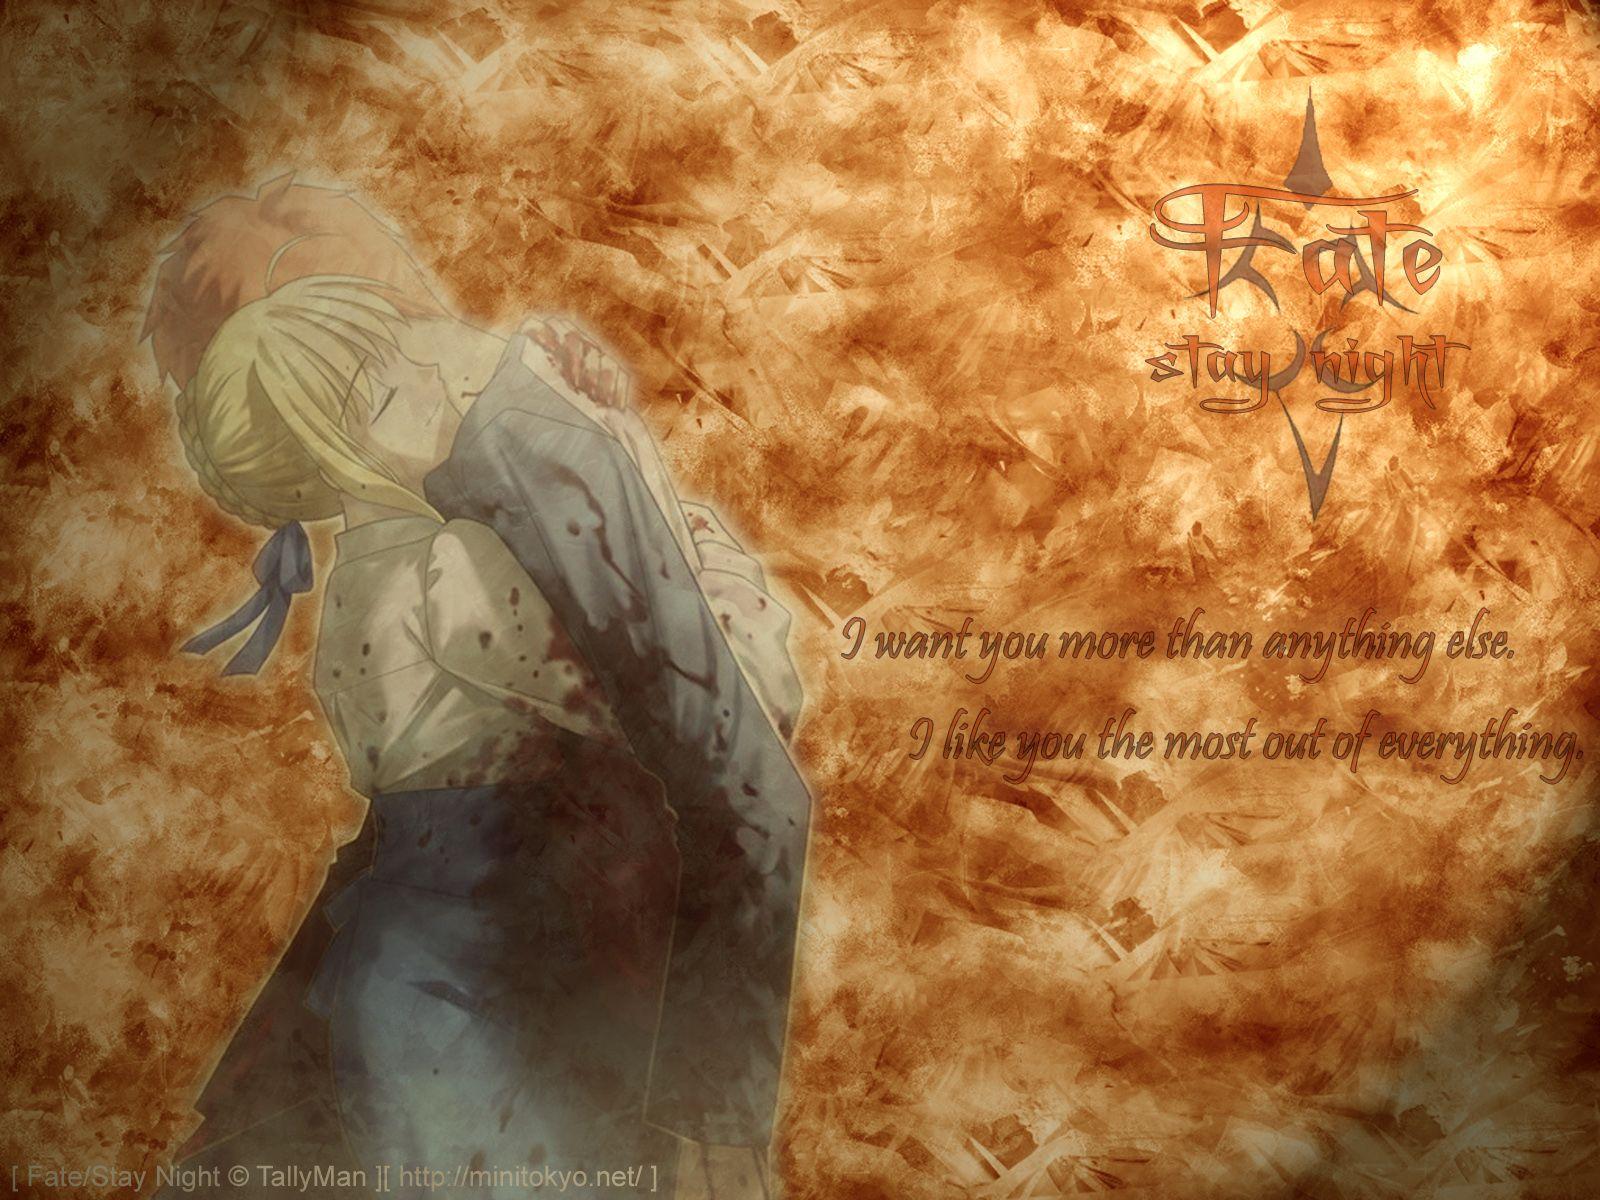 Minitokyo_Fate-Stay_Night_Wallpapers_245128.jpg